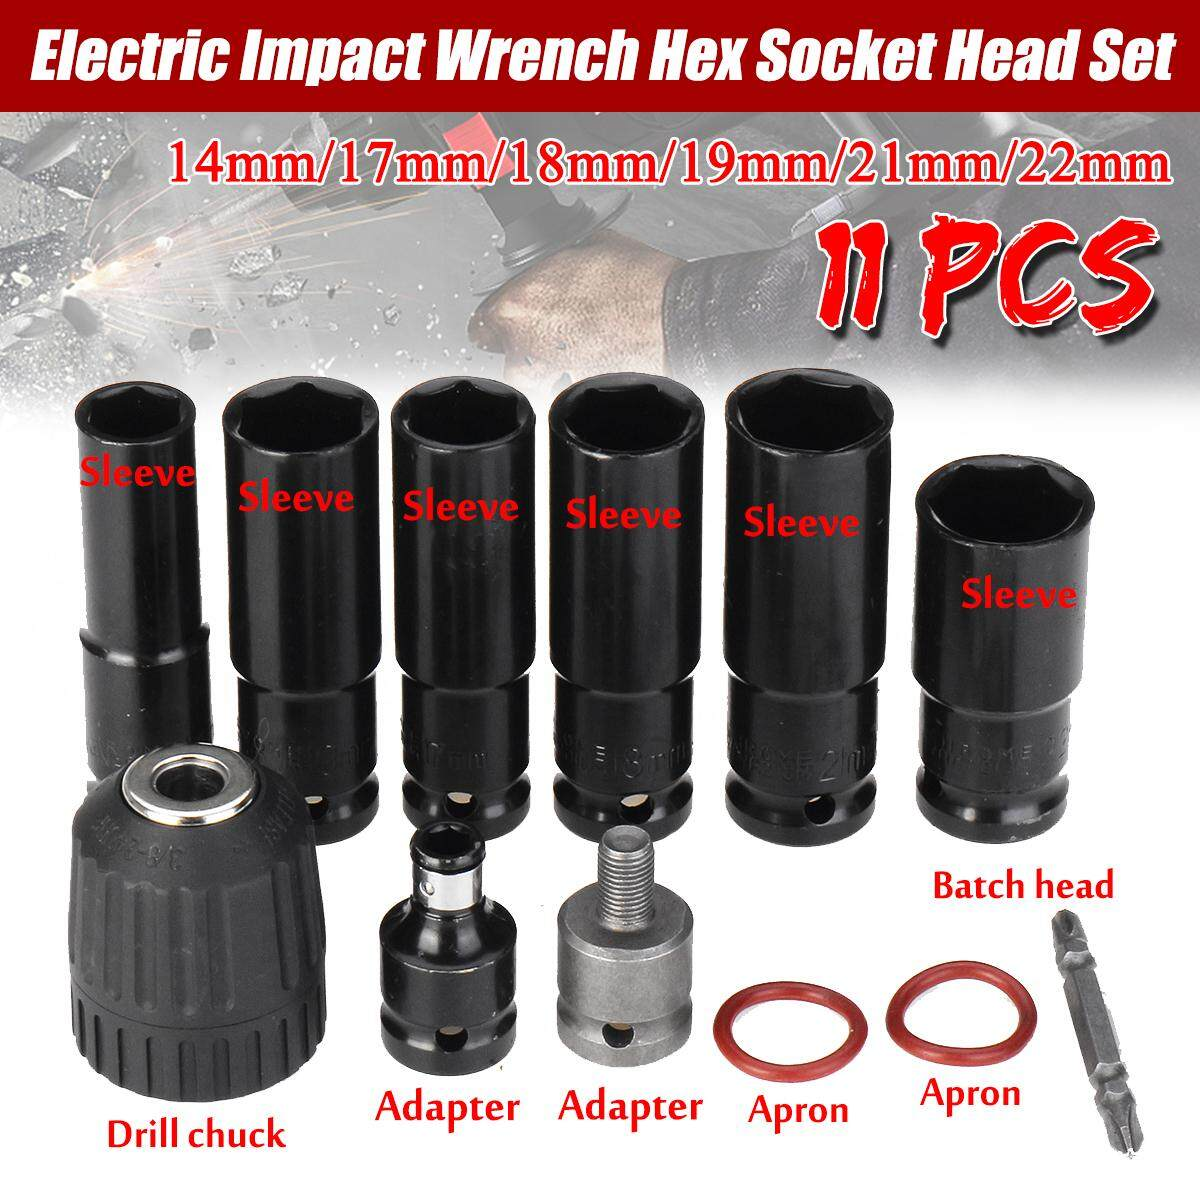 11pcs Impact Wrench Hex Socket Head Set